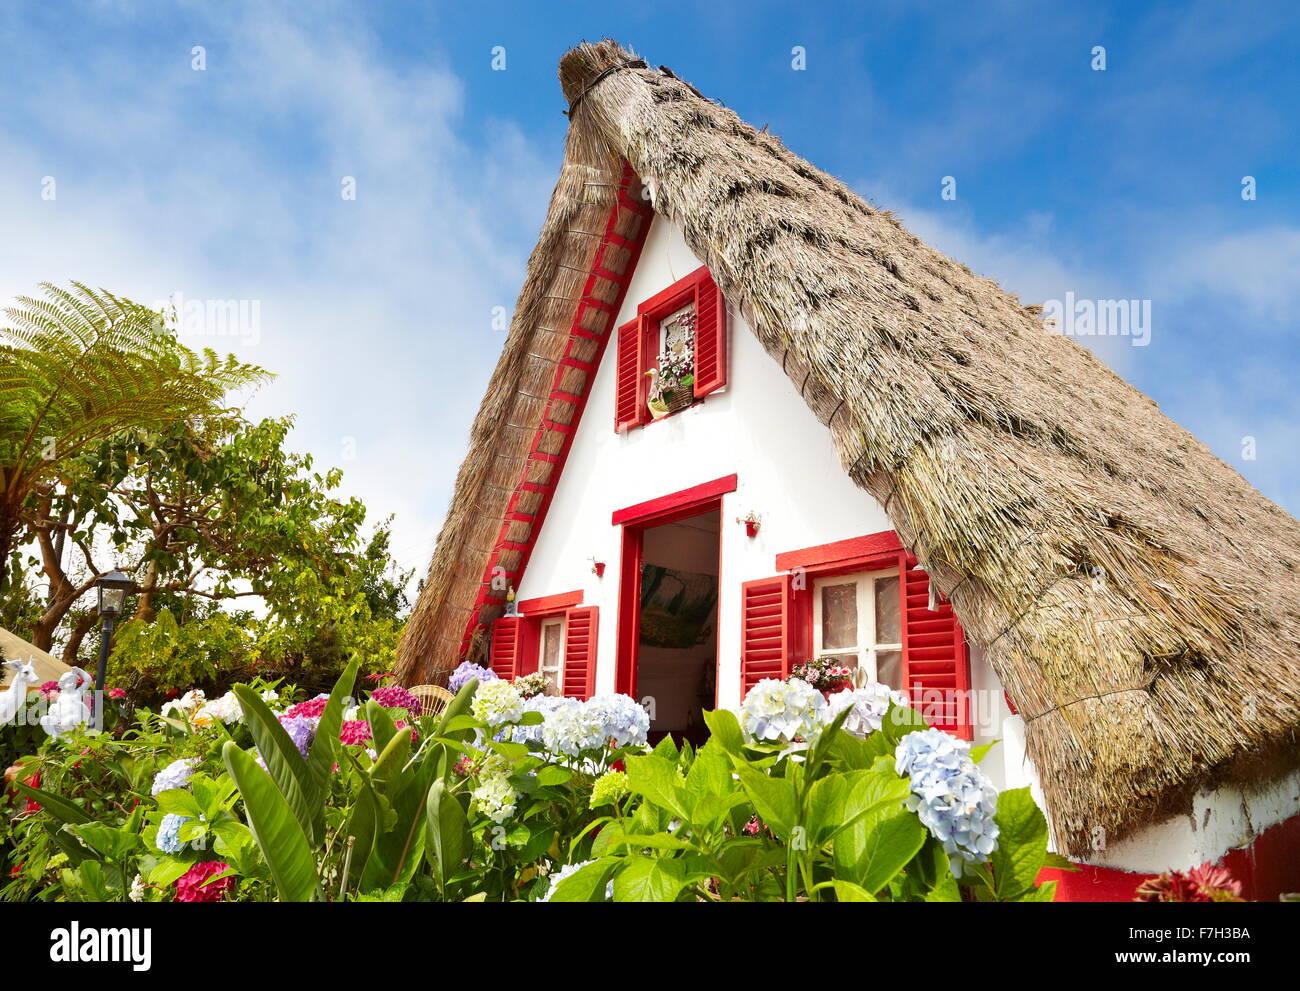 Traditionelle Heimat Postkartenmotiv - Santana-Dorf, die Insel Madeira, Portugal Stockbild